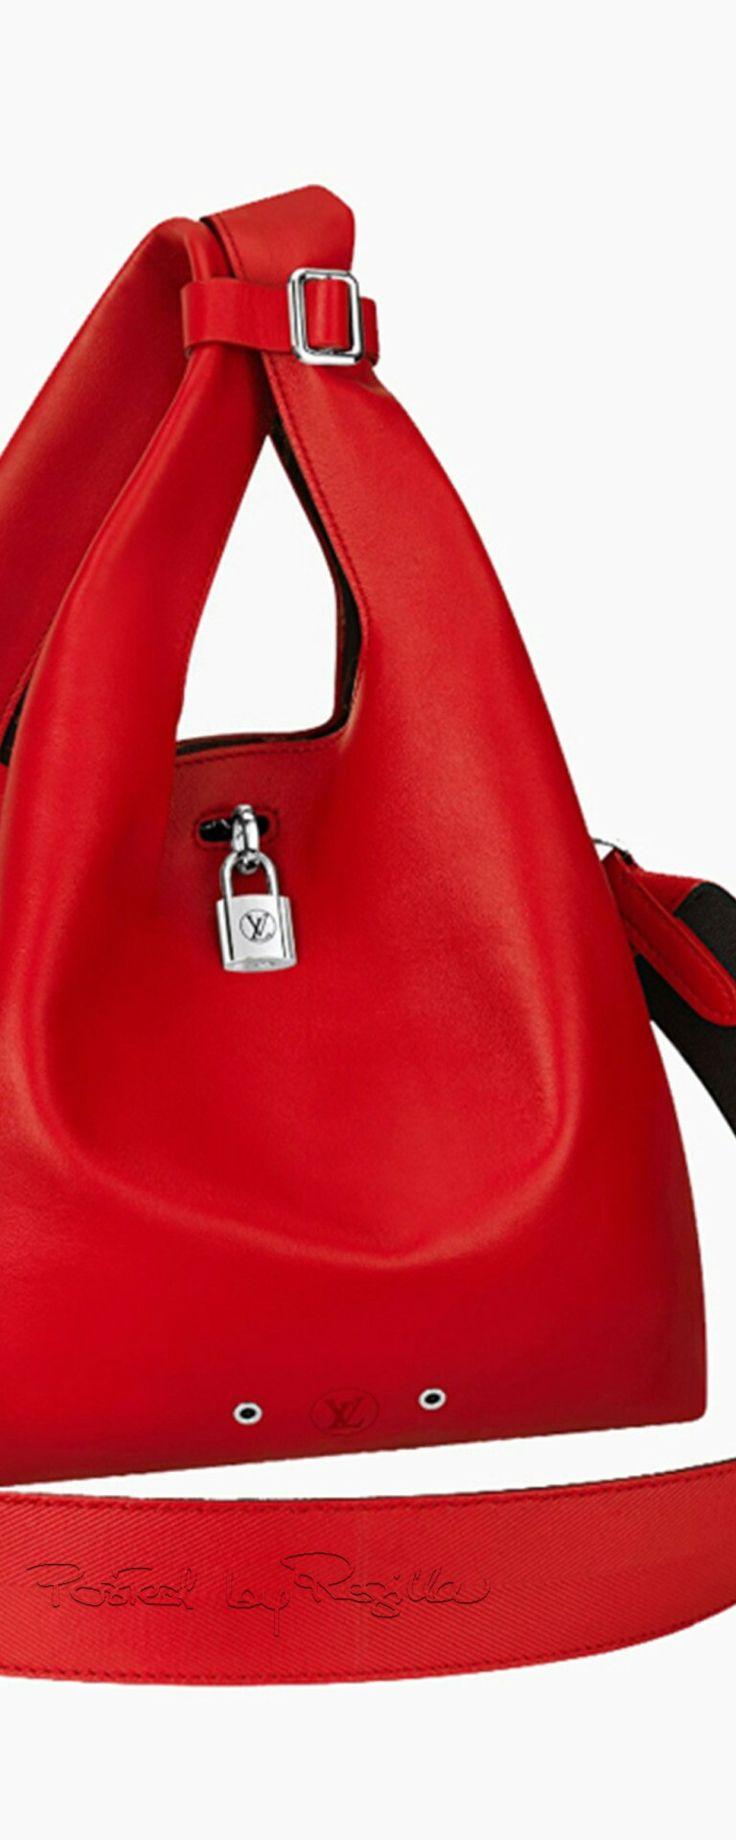 AA. bag, сумки модные брендовые, bag lovers,bloghandbags.blogspot.com